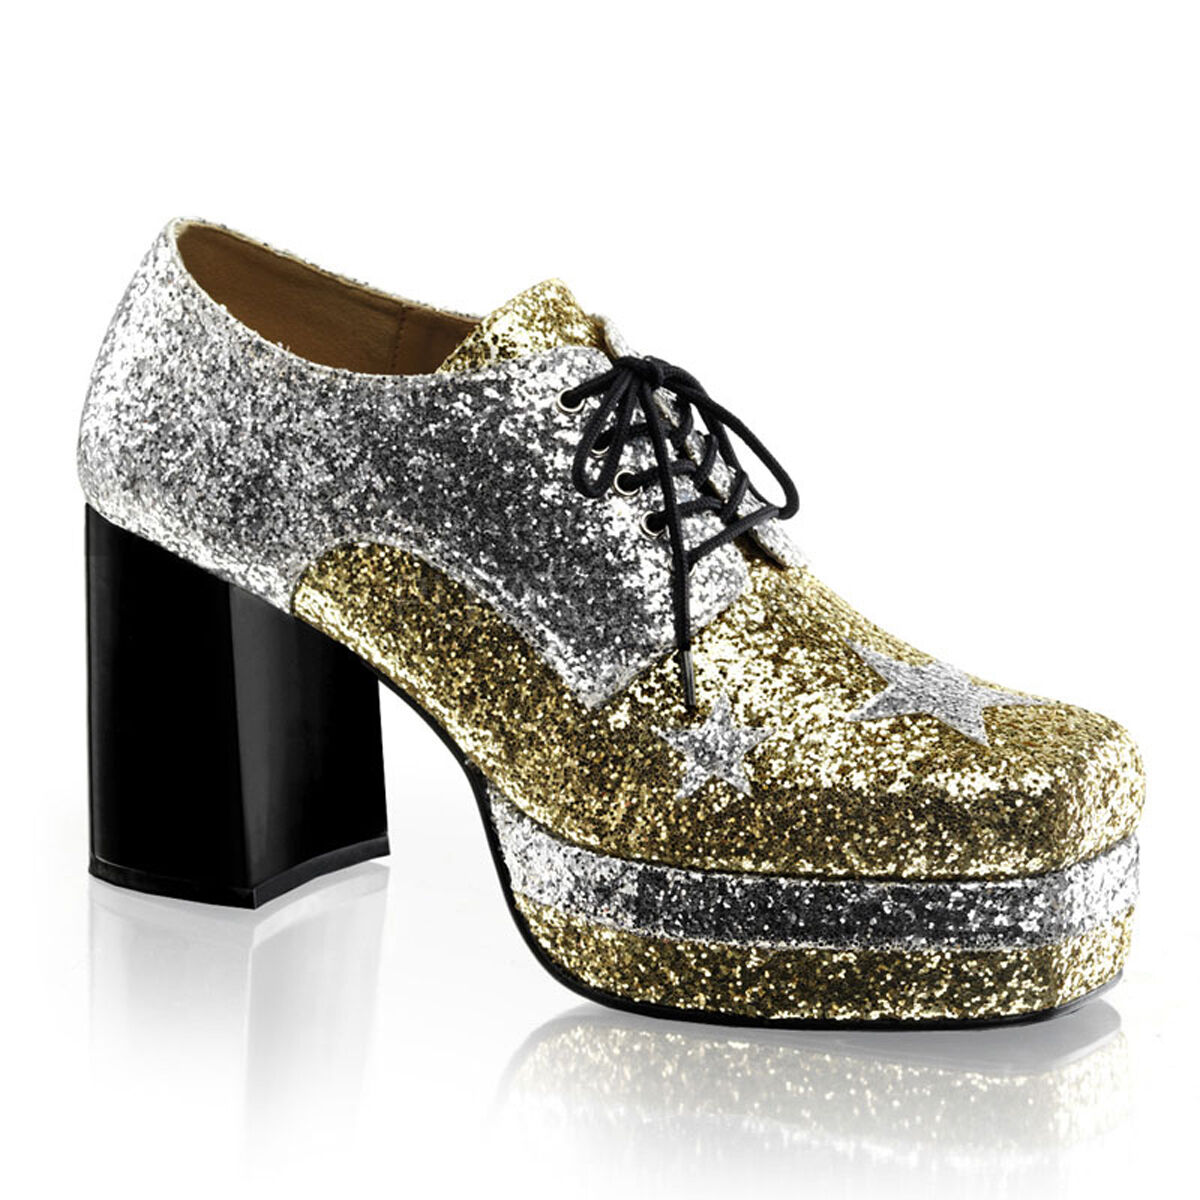 Silver Gold Pimp Daddy Disco Shoes Dancer Platform Costume Mens Shoes Disco size 9 10 11 12 c78bbf